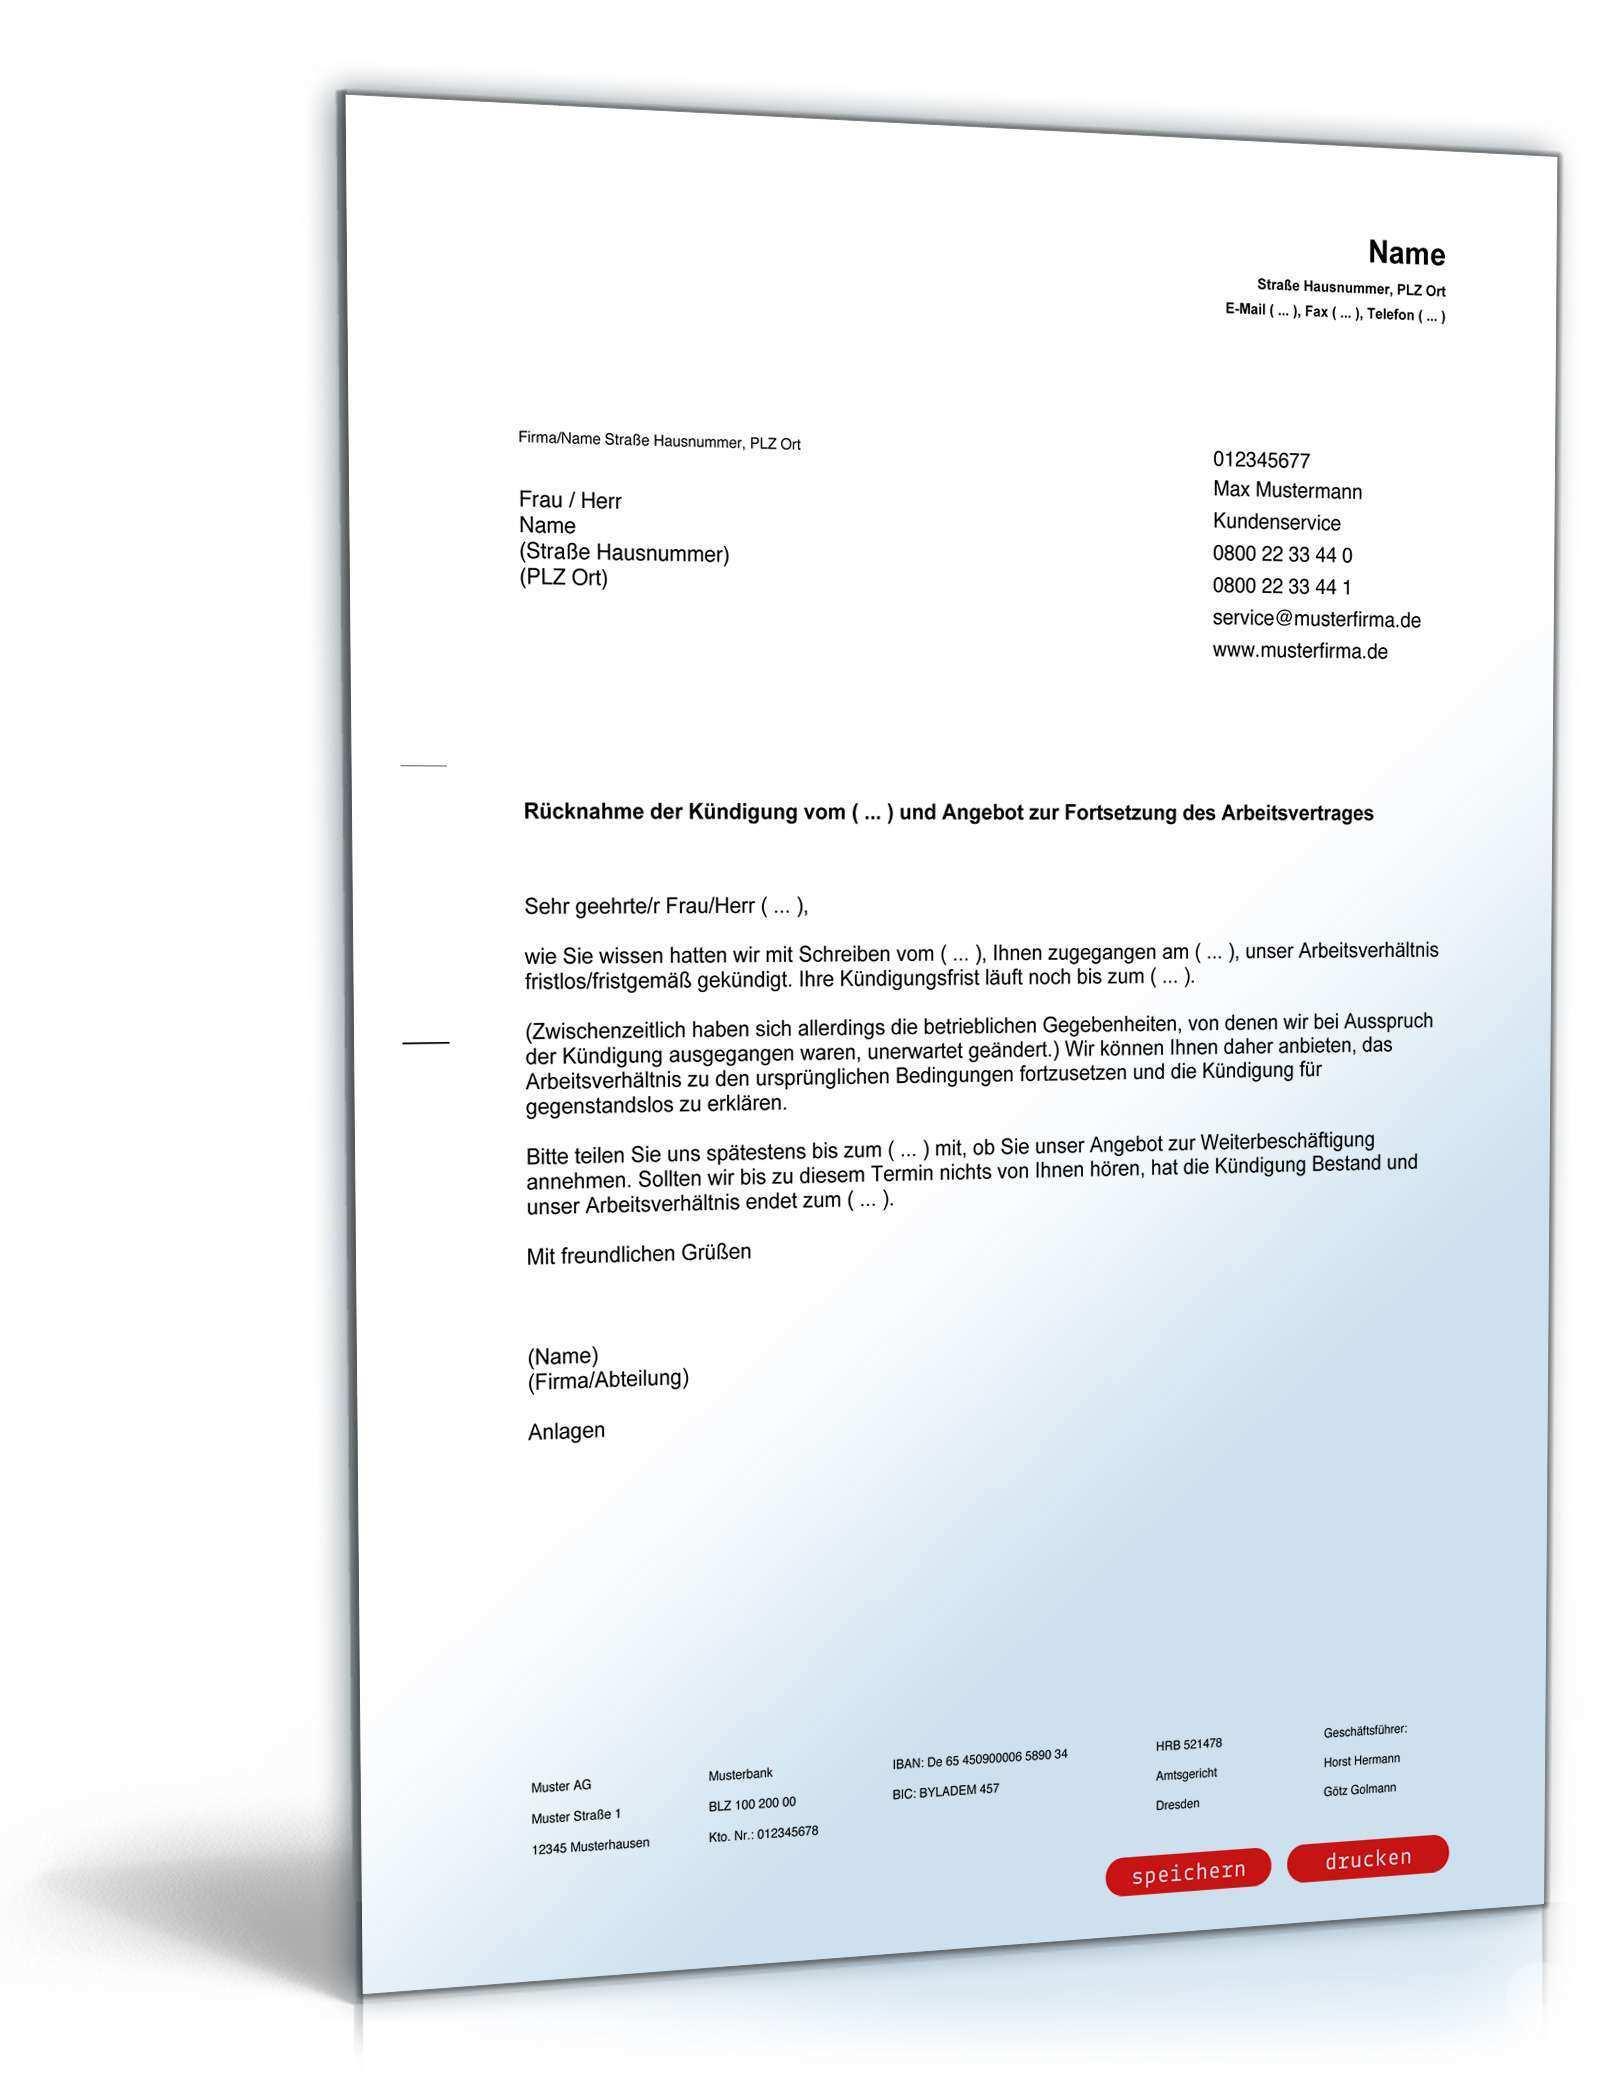 Rucknahme Kundigung Arbeitsvertrag Muster Zum Download